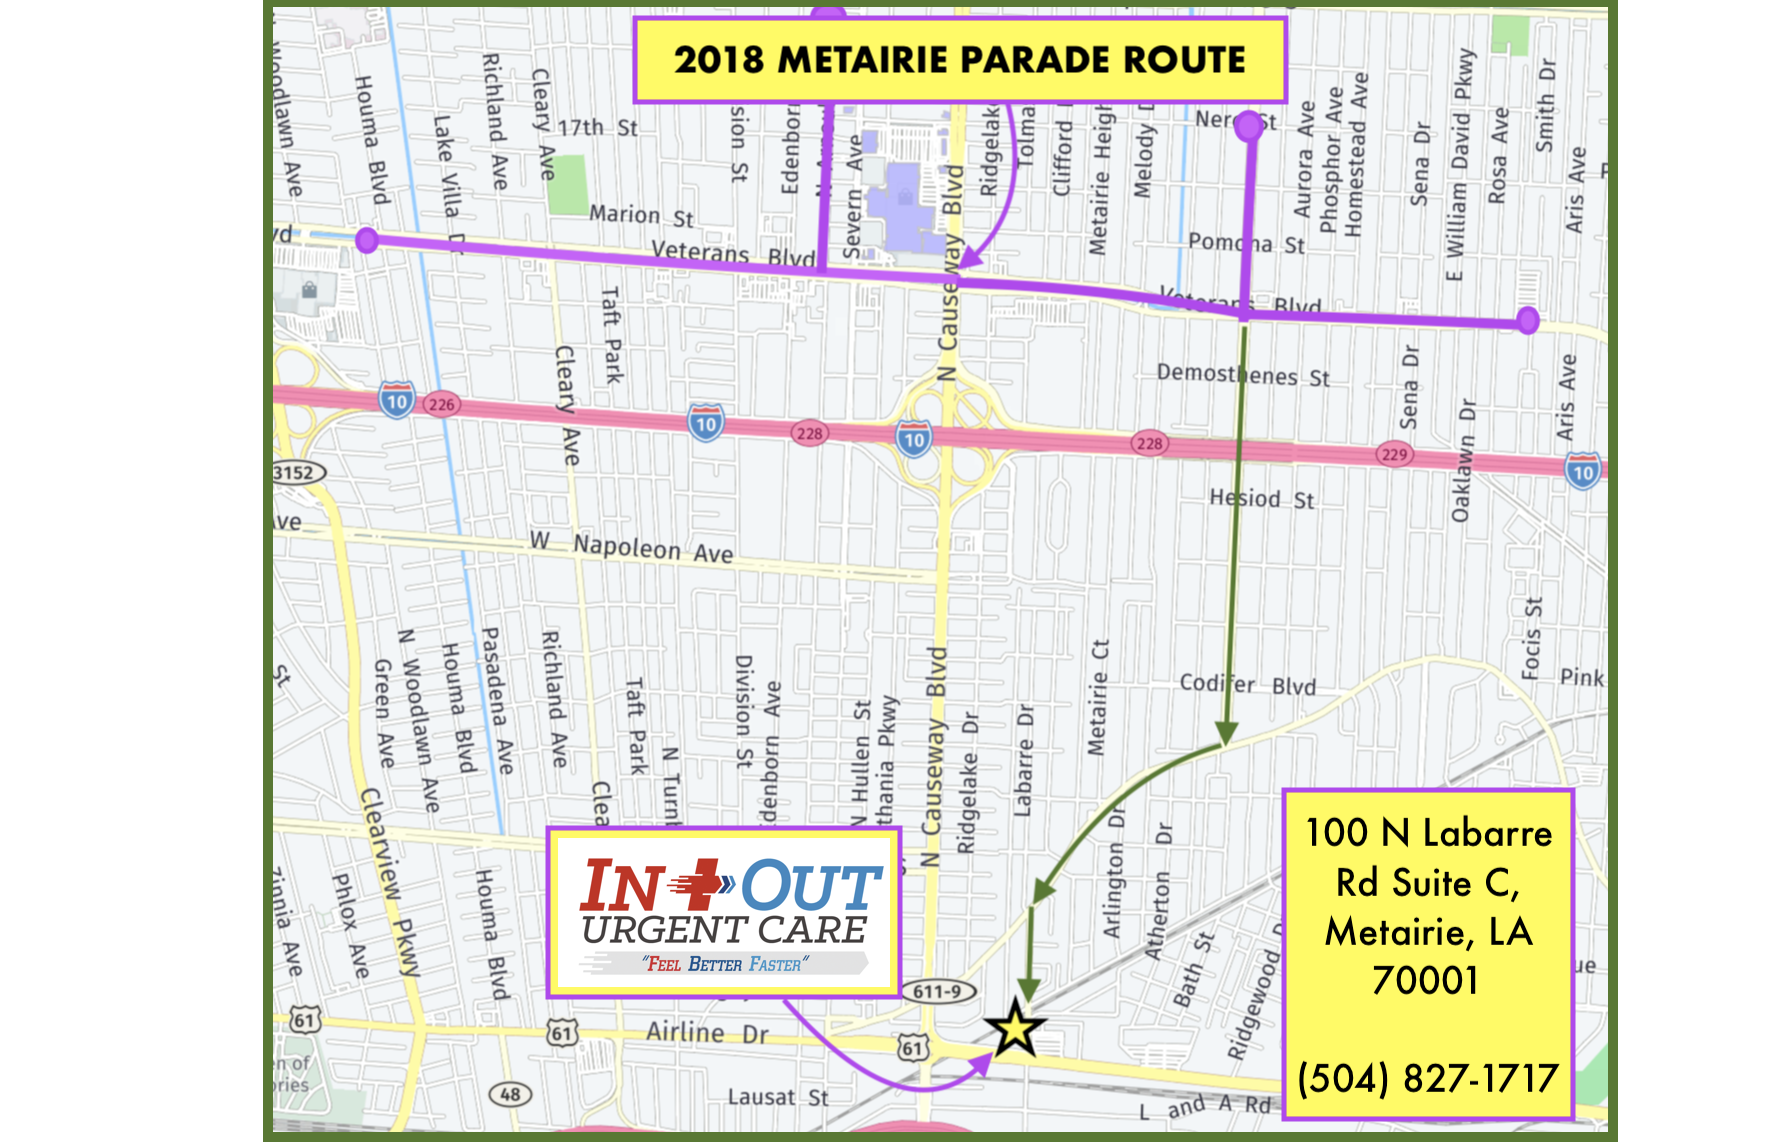 Metairie Parade Map 2018